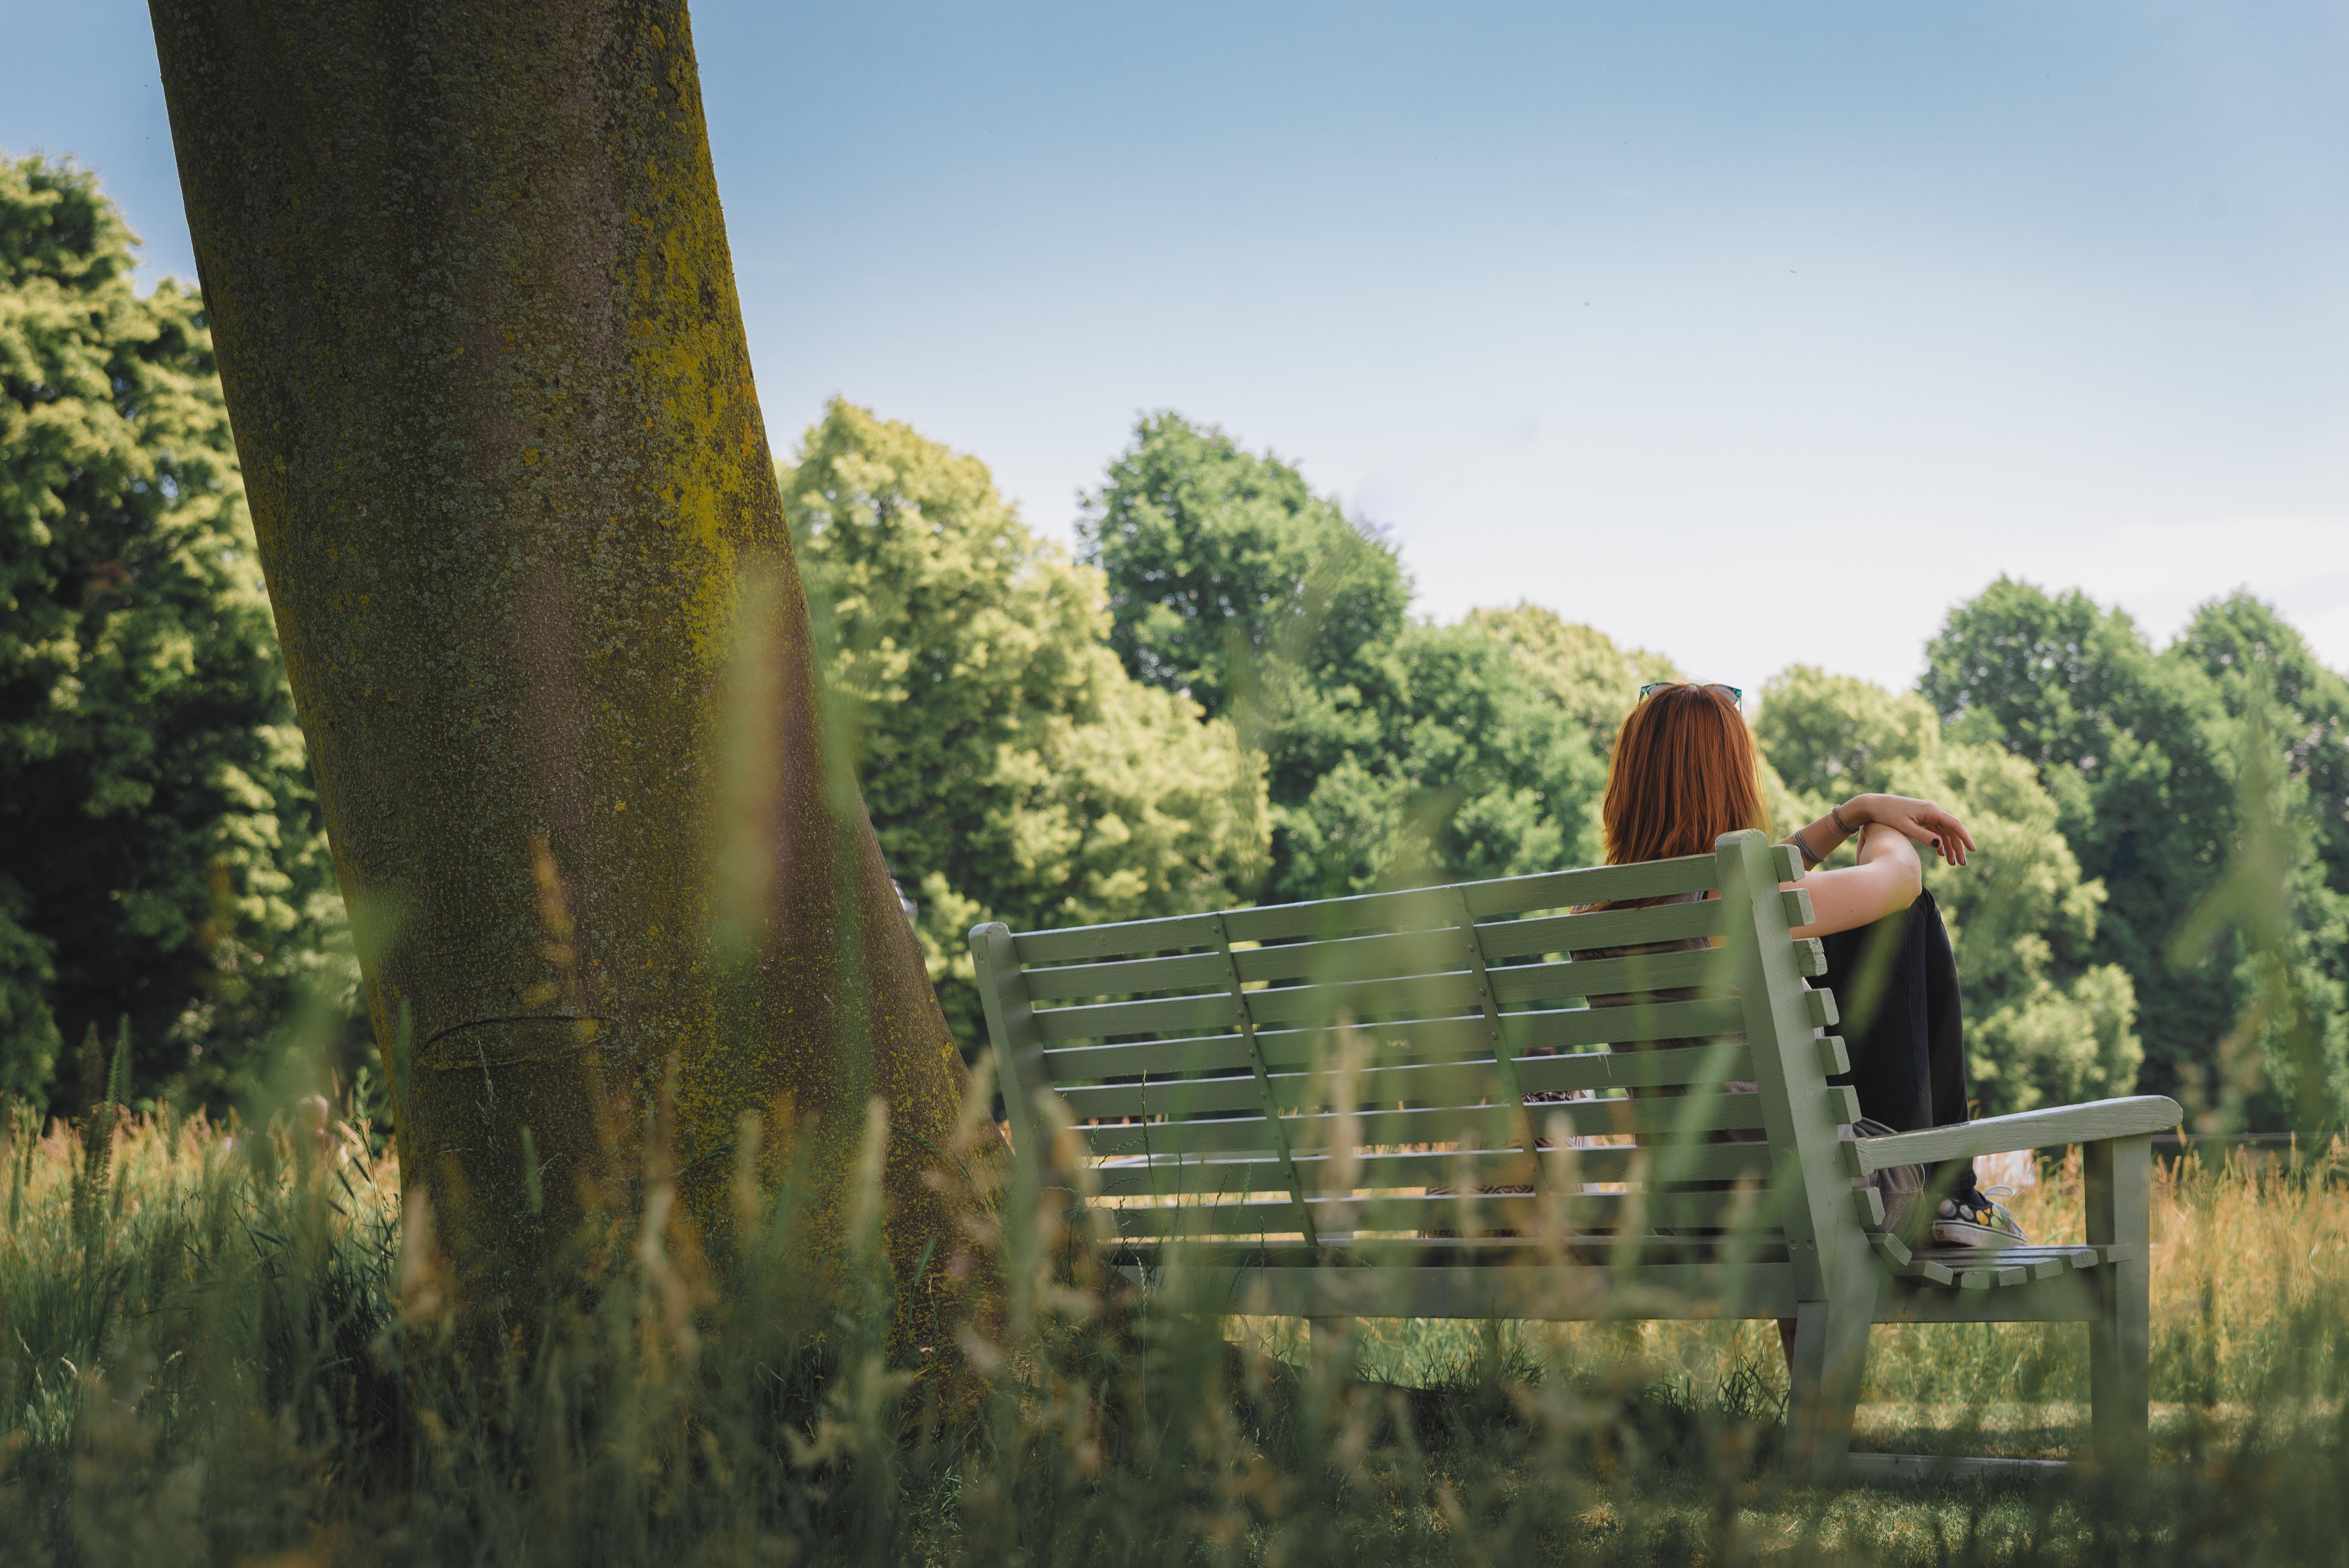 woman sitting on bench beside tree